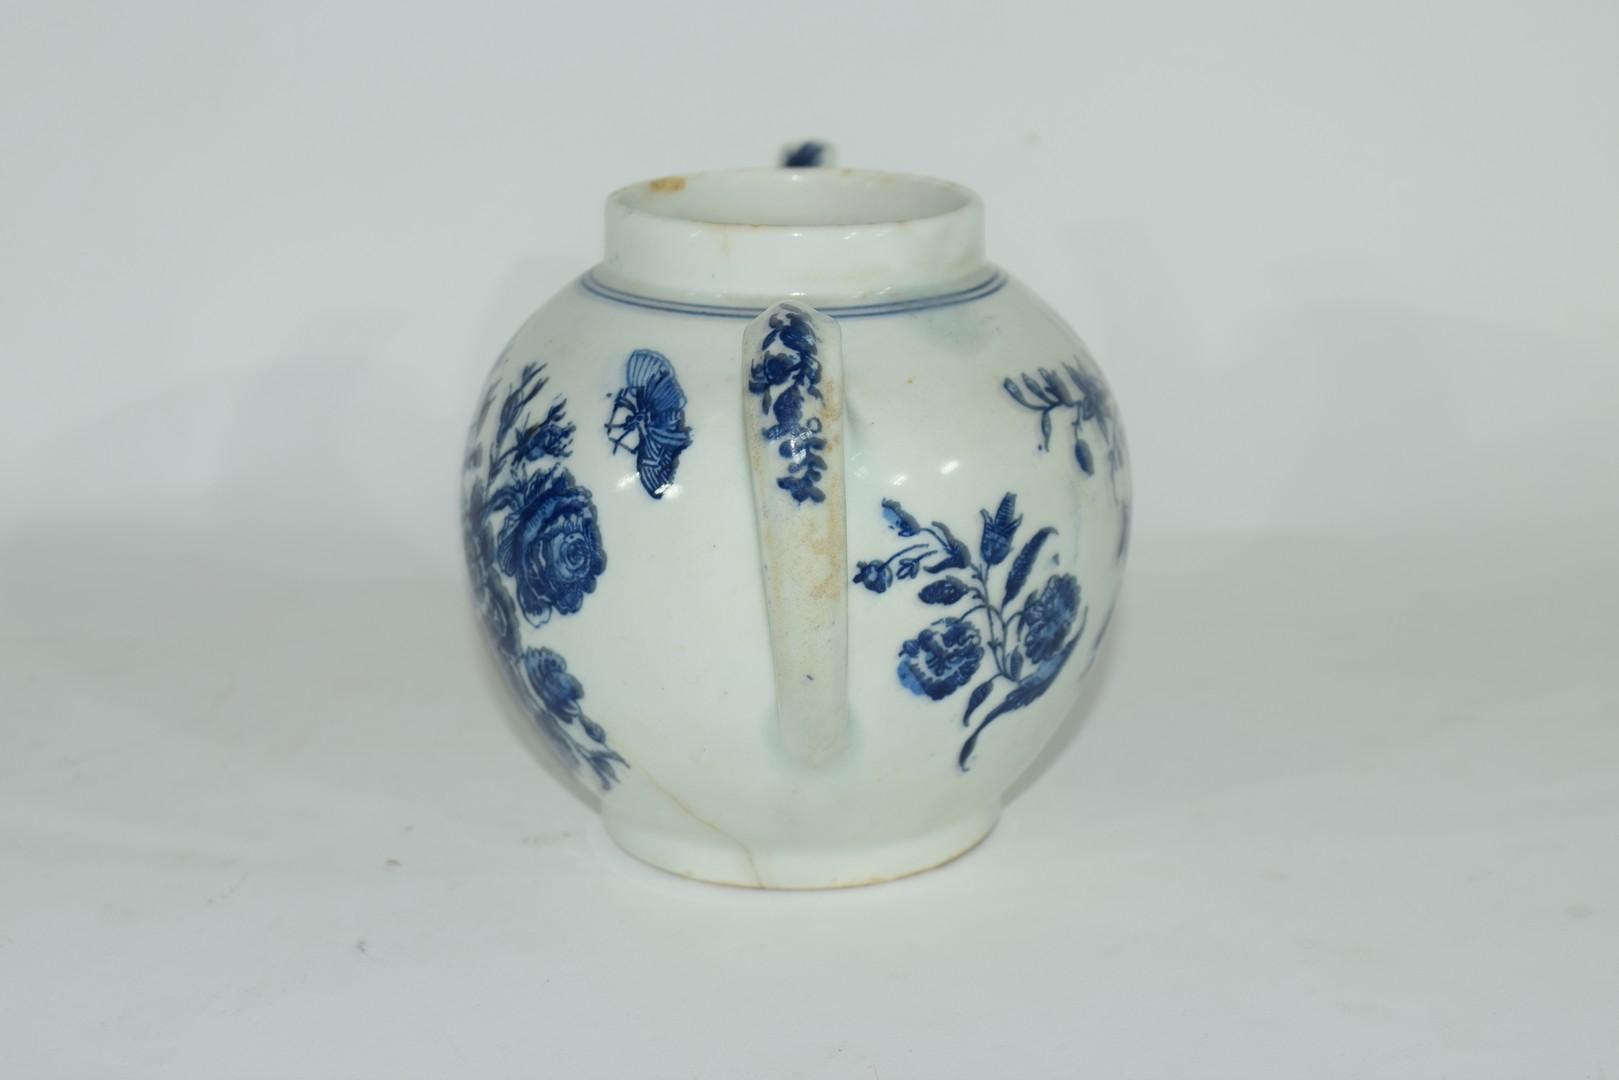 18th century Lowestoft porcelain teapot - Image 4 of 8